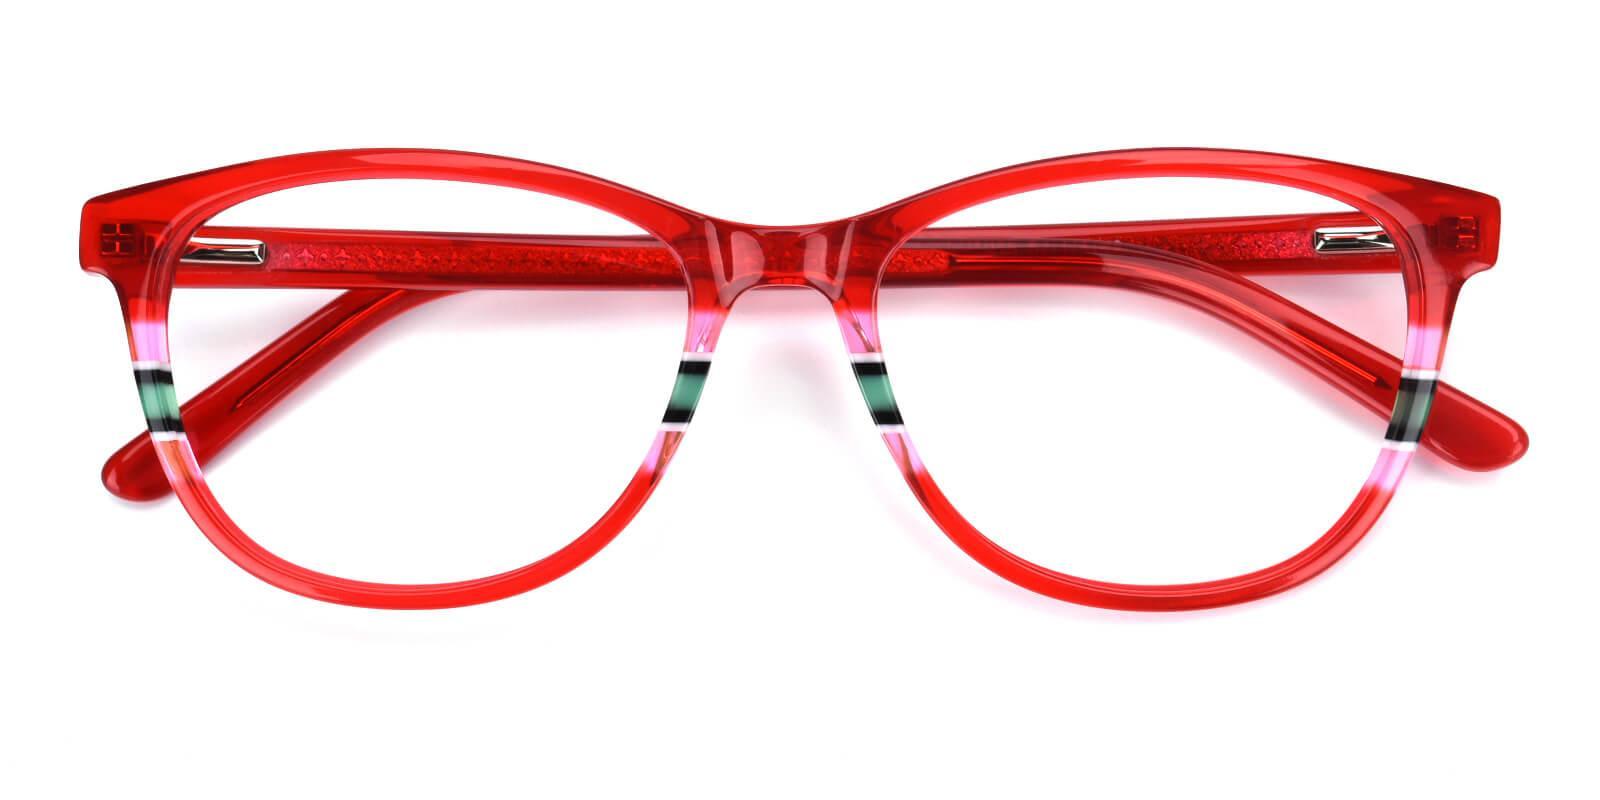 Faithely-Red-Square-Acetate-Eyeglasses-detail